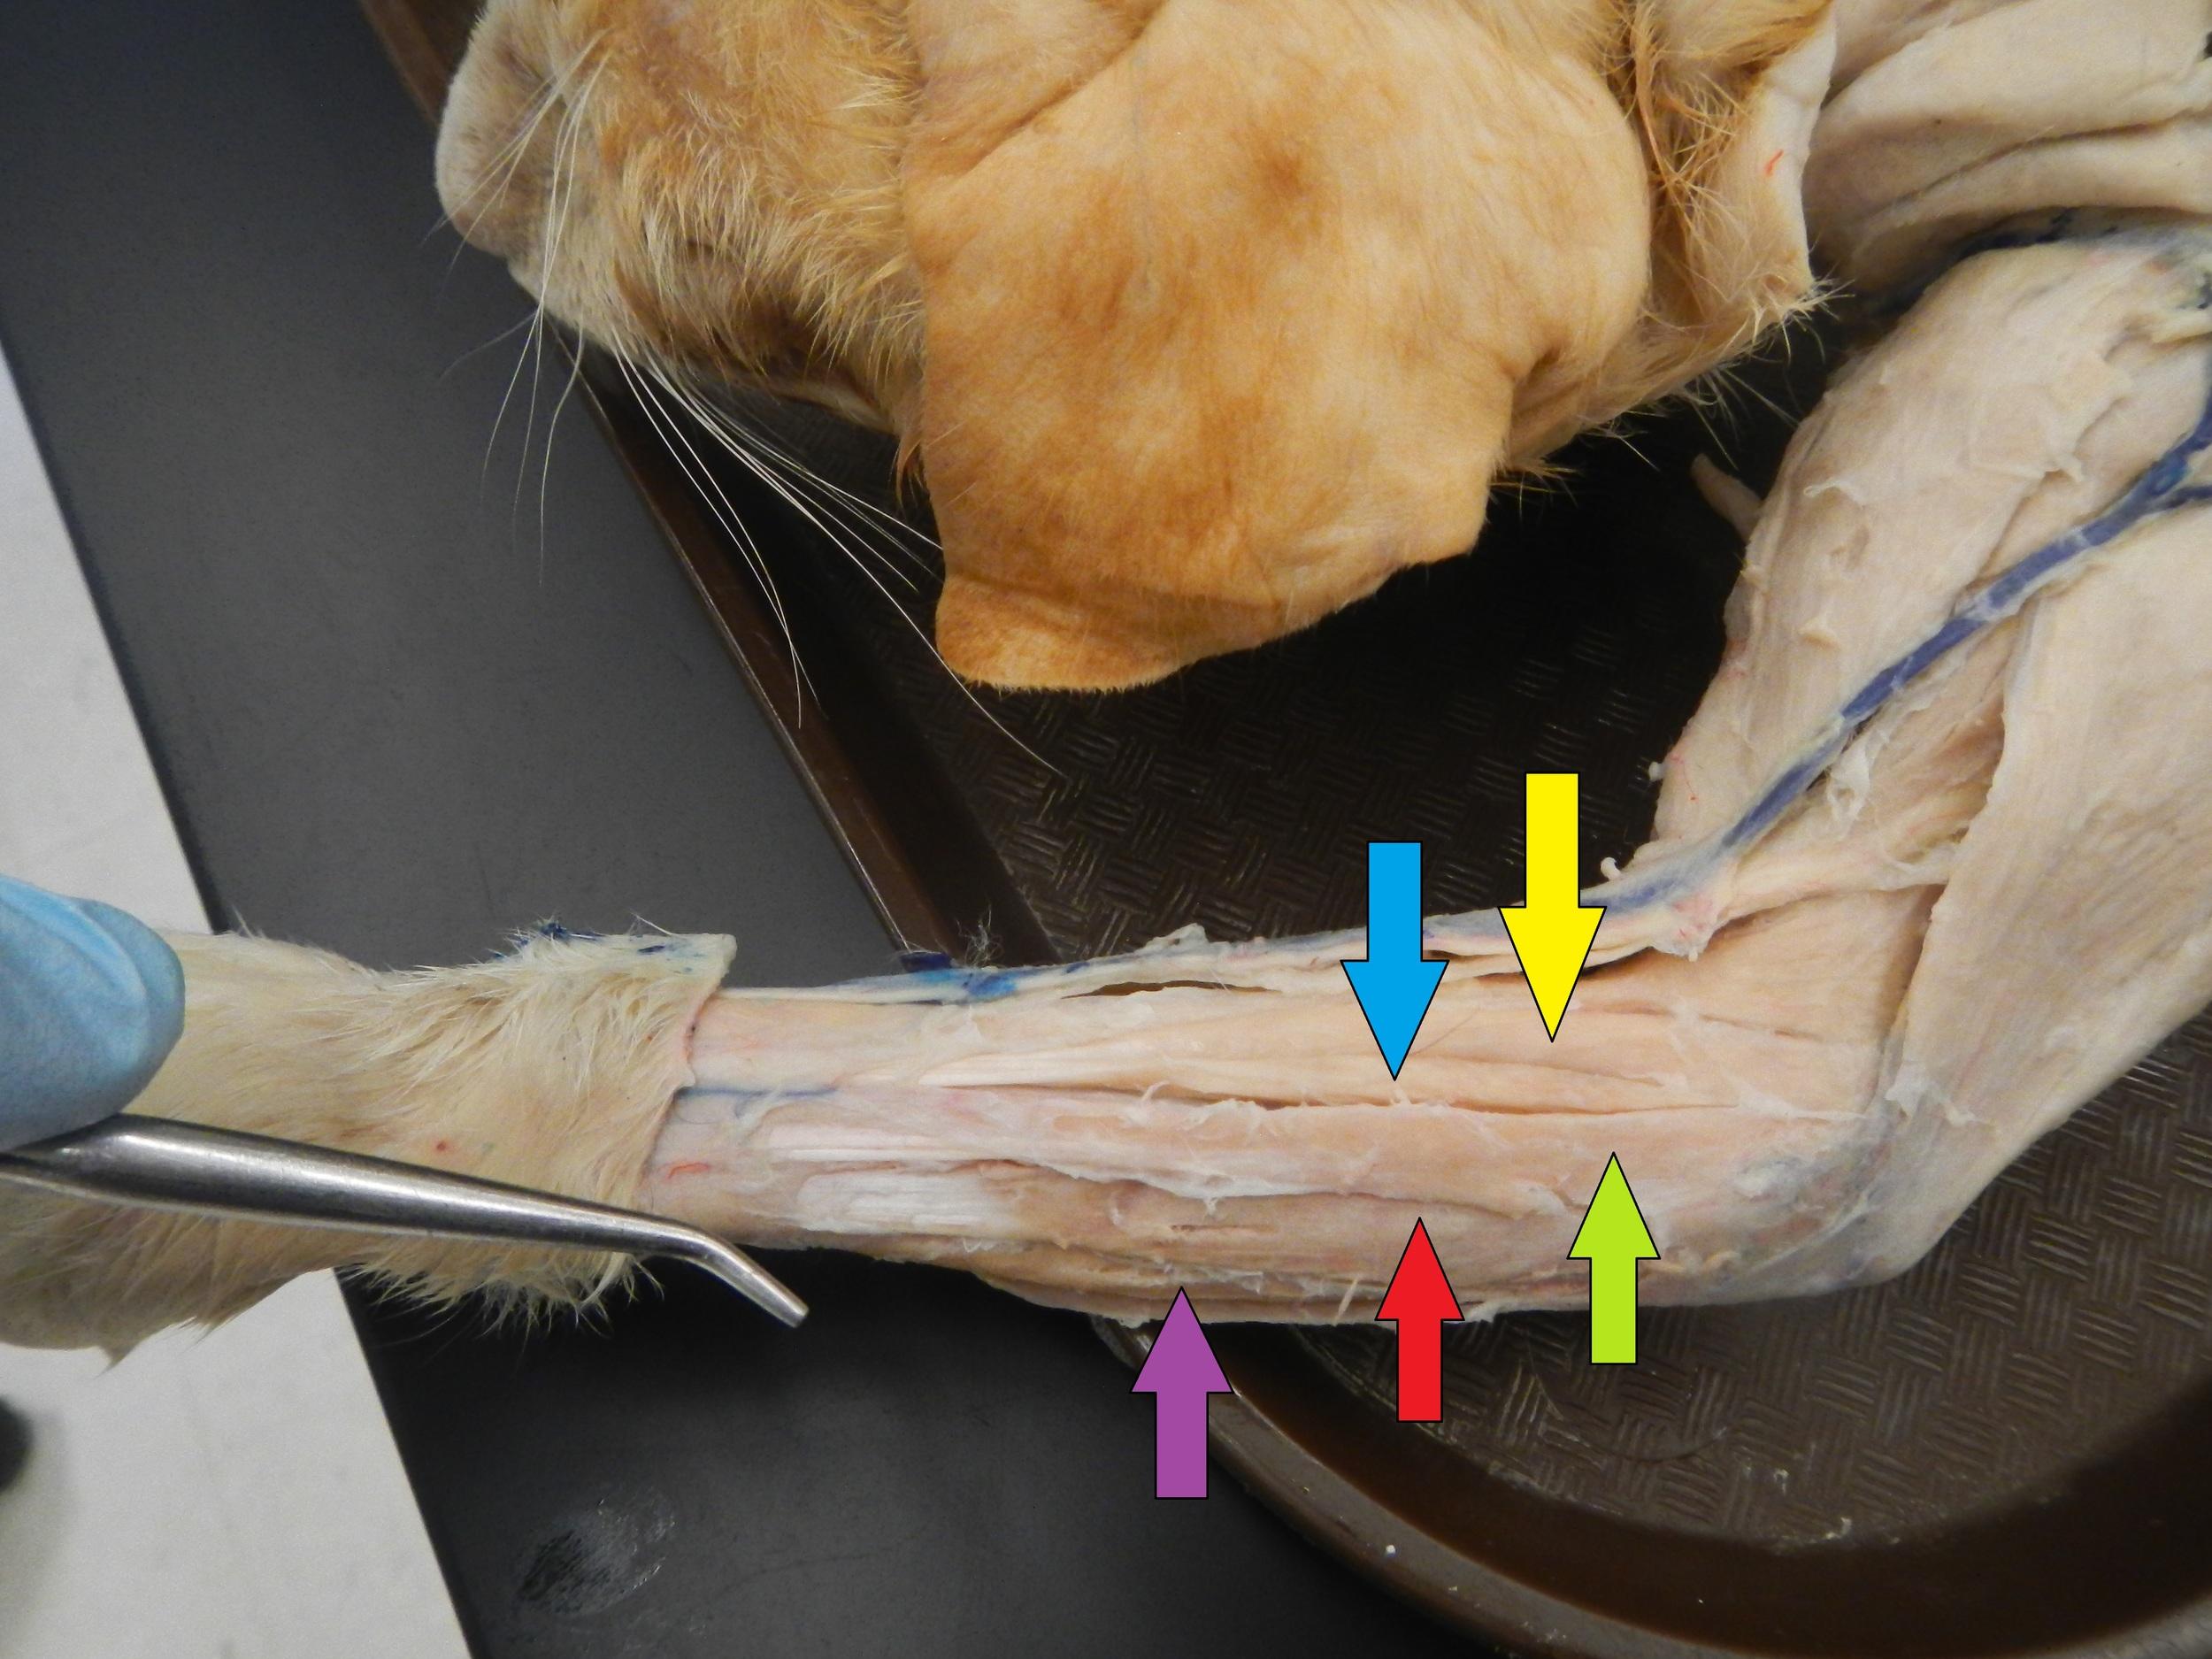 Forearm Extensors     Yellow: Extensor Carpi Radialis Longus    Blue: Extensor Carpi Radialis Brevis    Green: Extensor Digitorum    Red: Extensor Digitorum Lateralis     Purple: Extensor Carpi Ulnaris